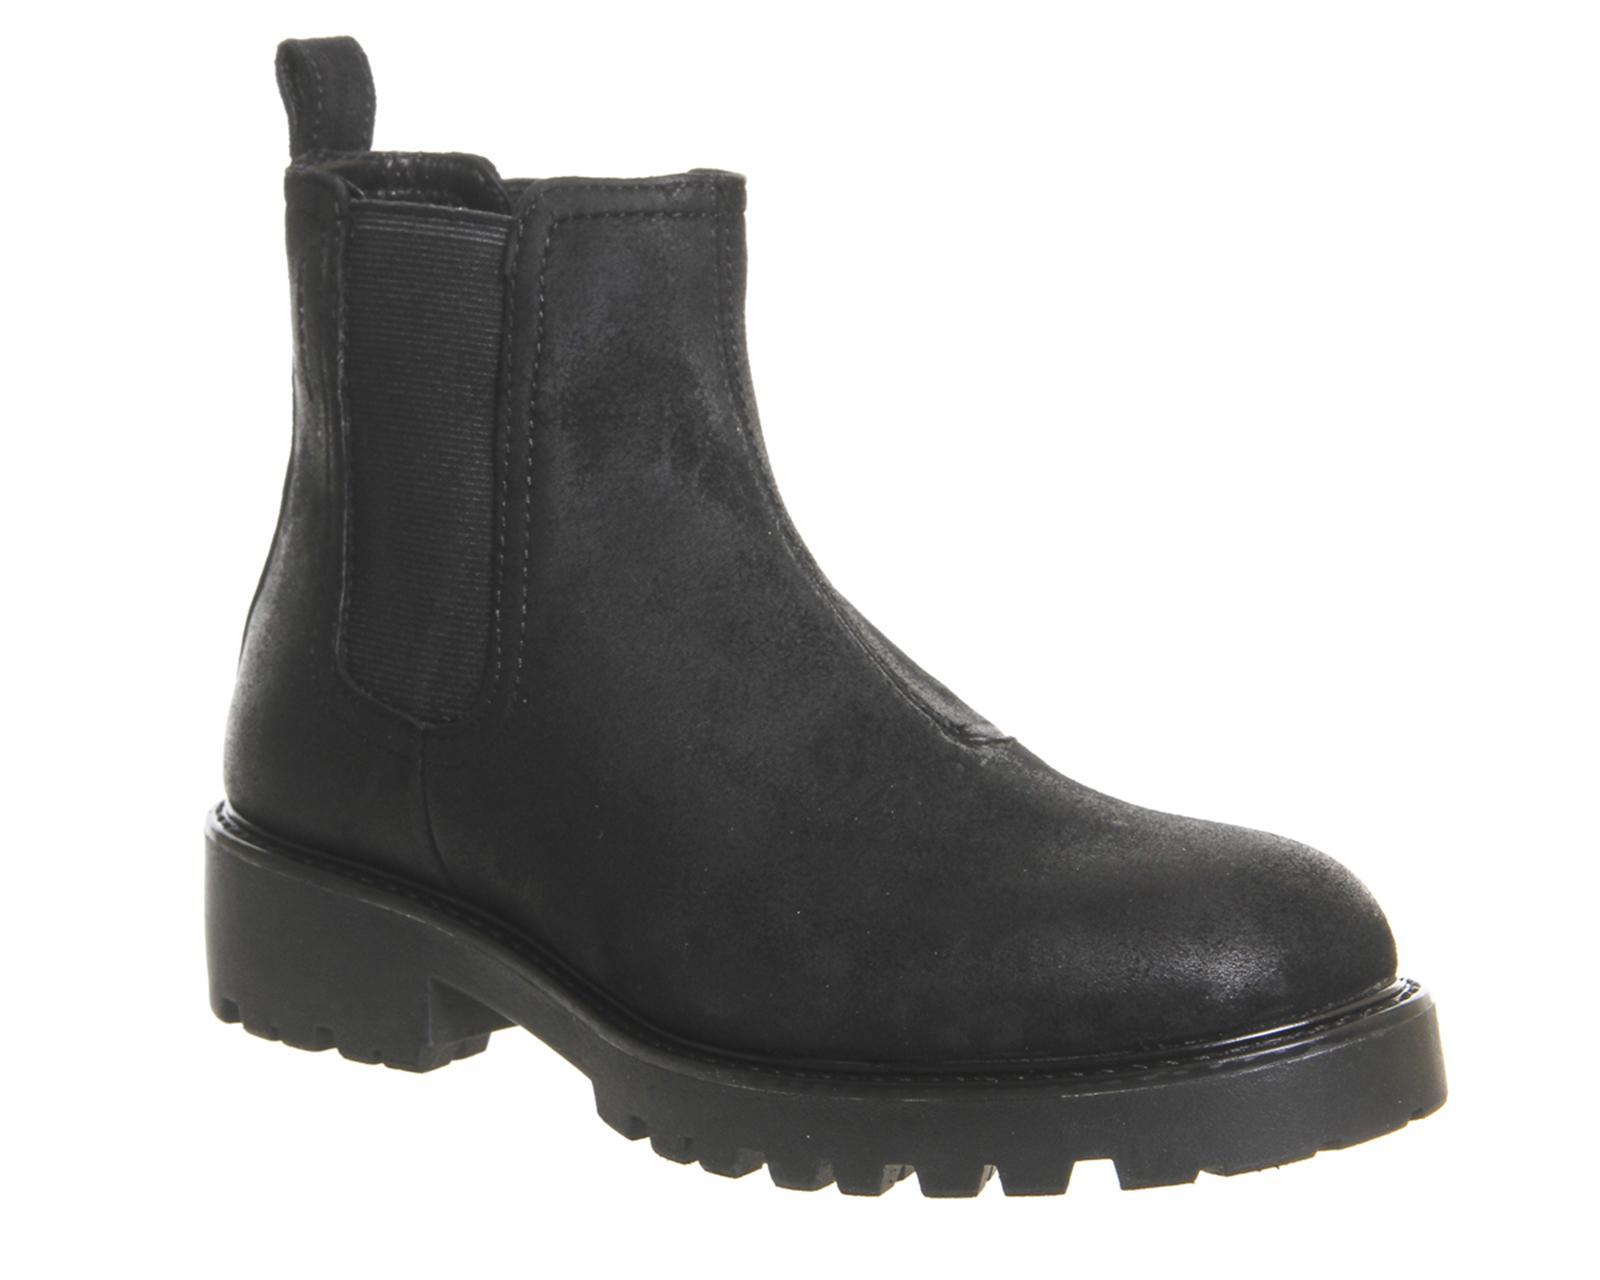 Vagabond Kenova Chelsea Boots in Black | Lyst